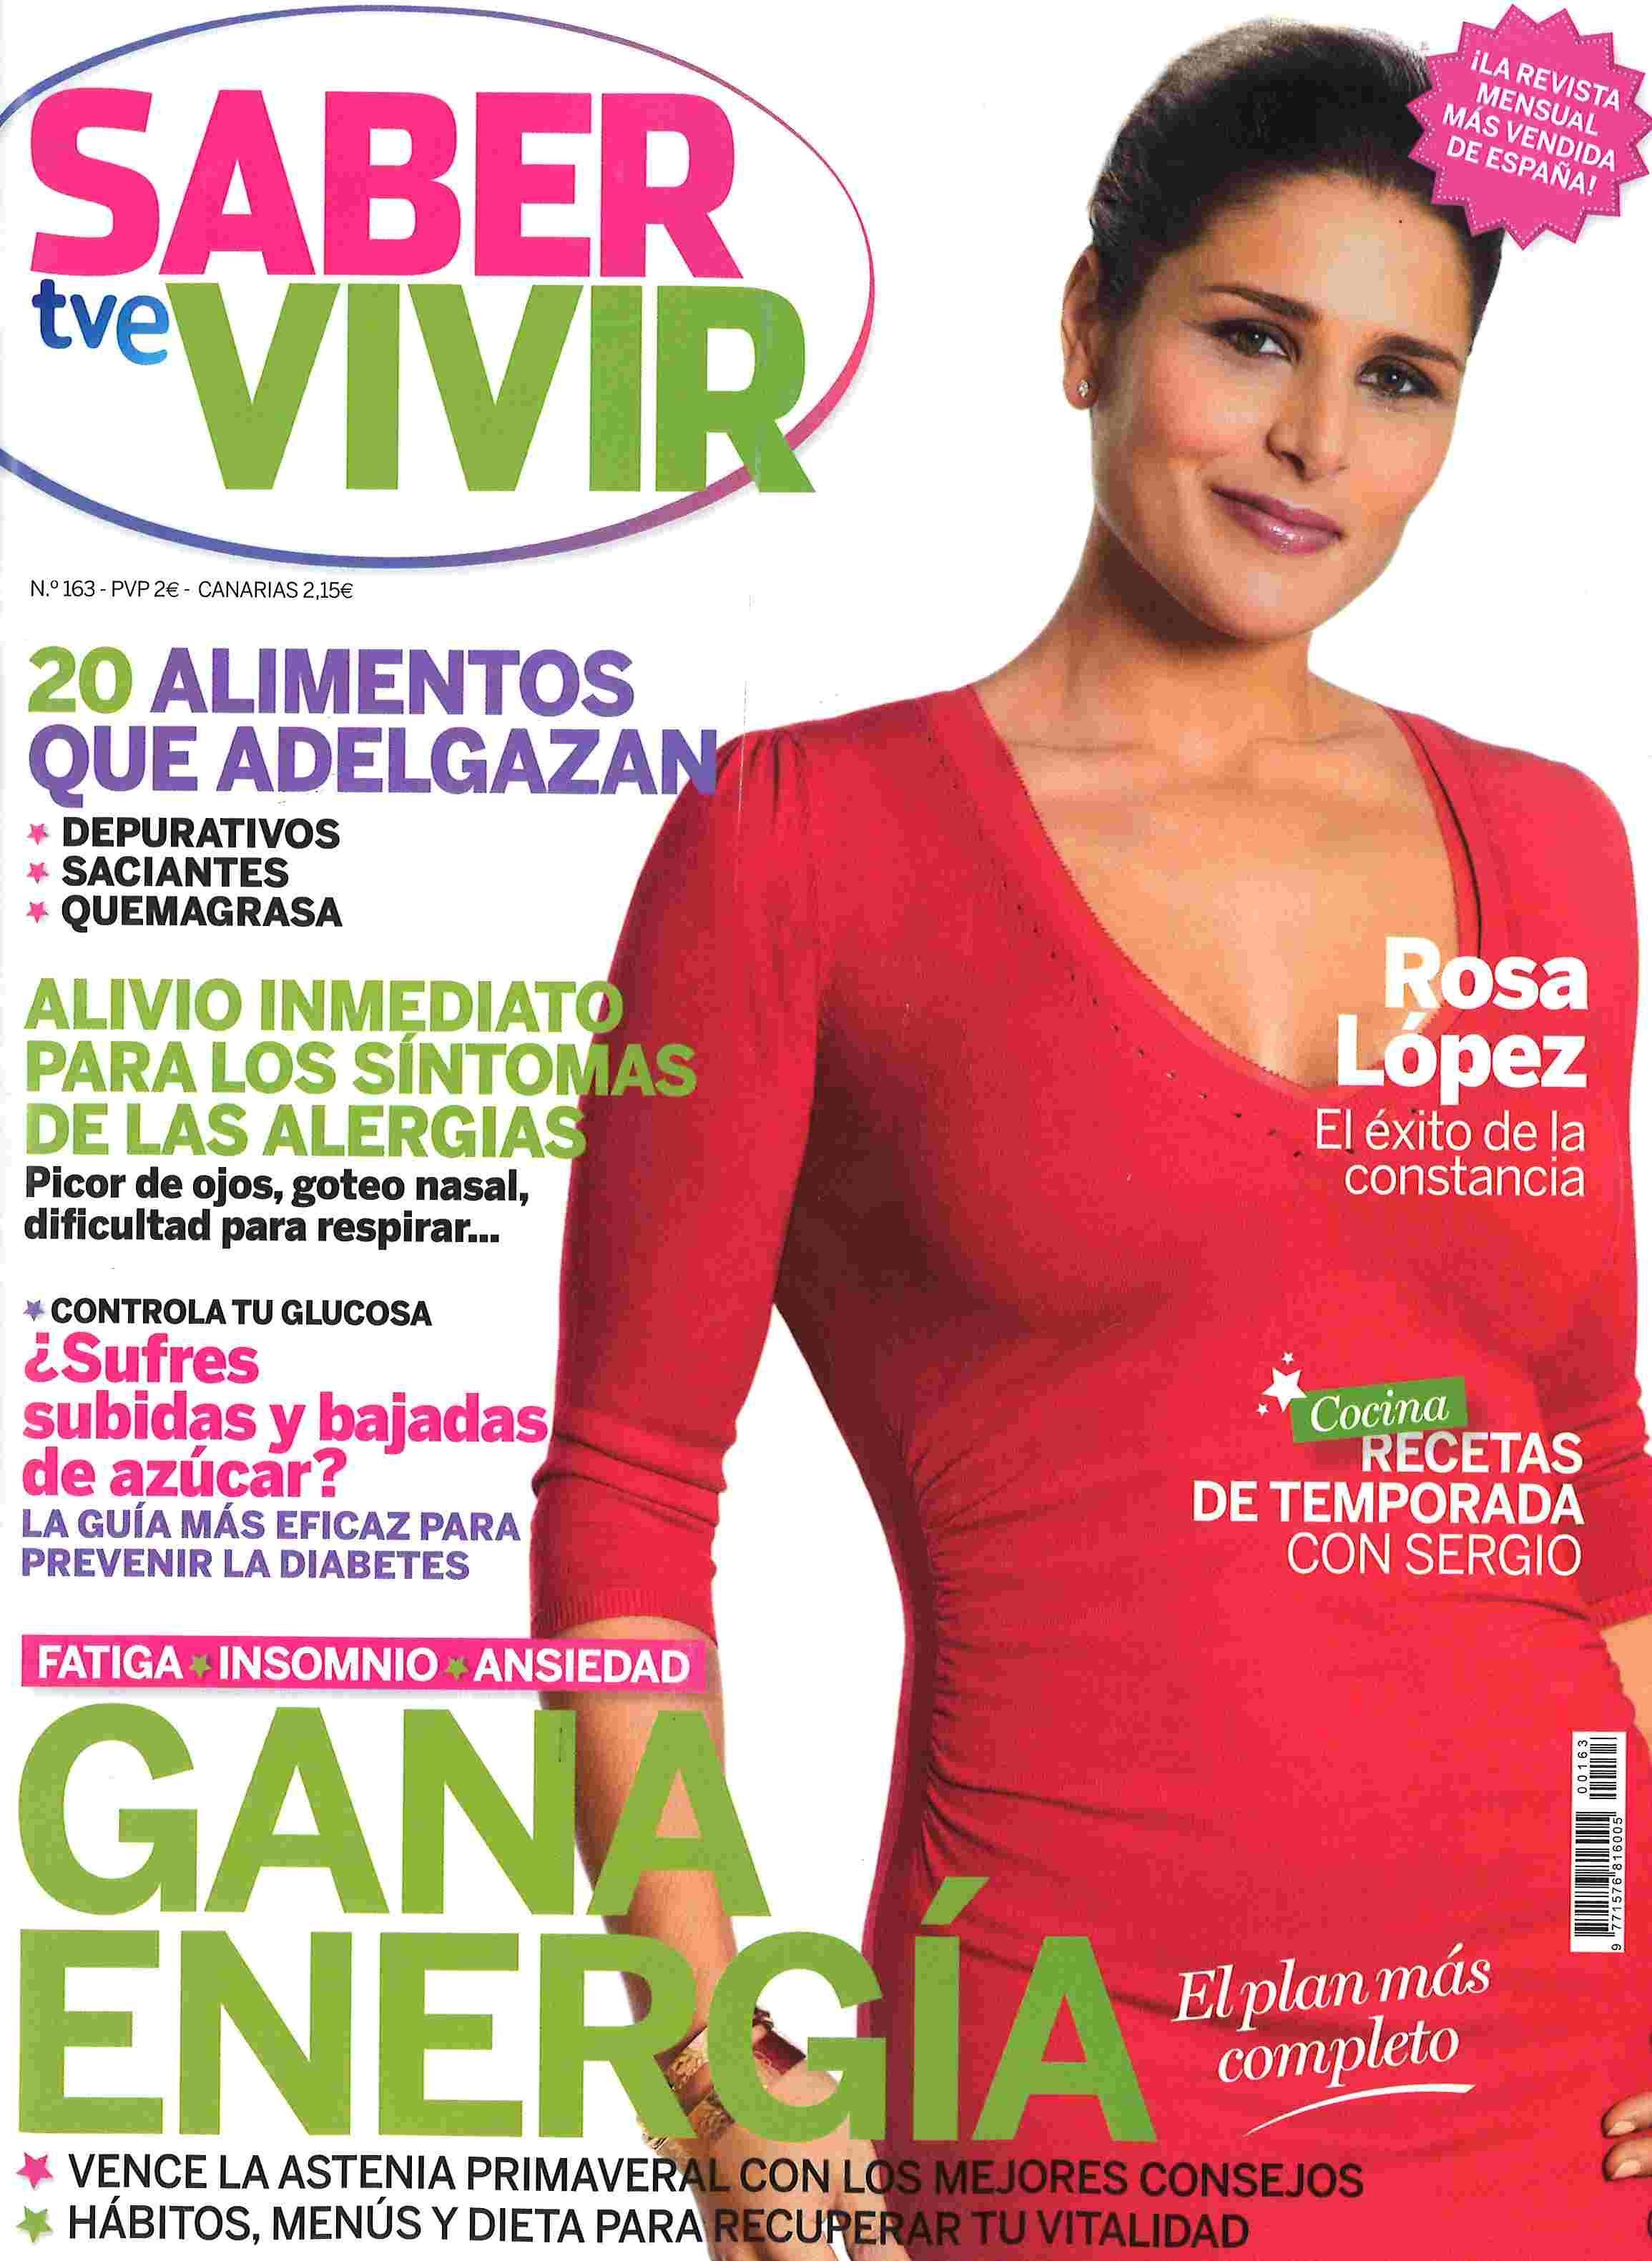 Saber Vivir N 163 Maio 2014 Revistas Pinterest Revistas ~ Dieta Adelgazamiento Saber Vivir